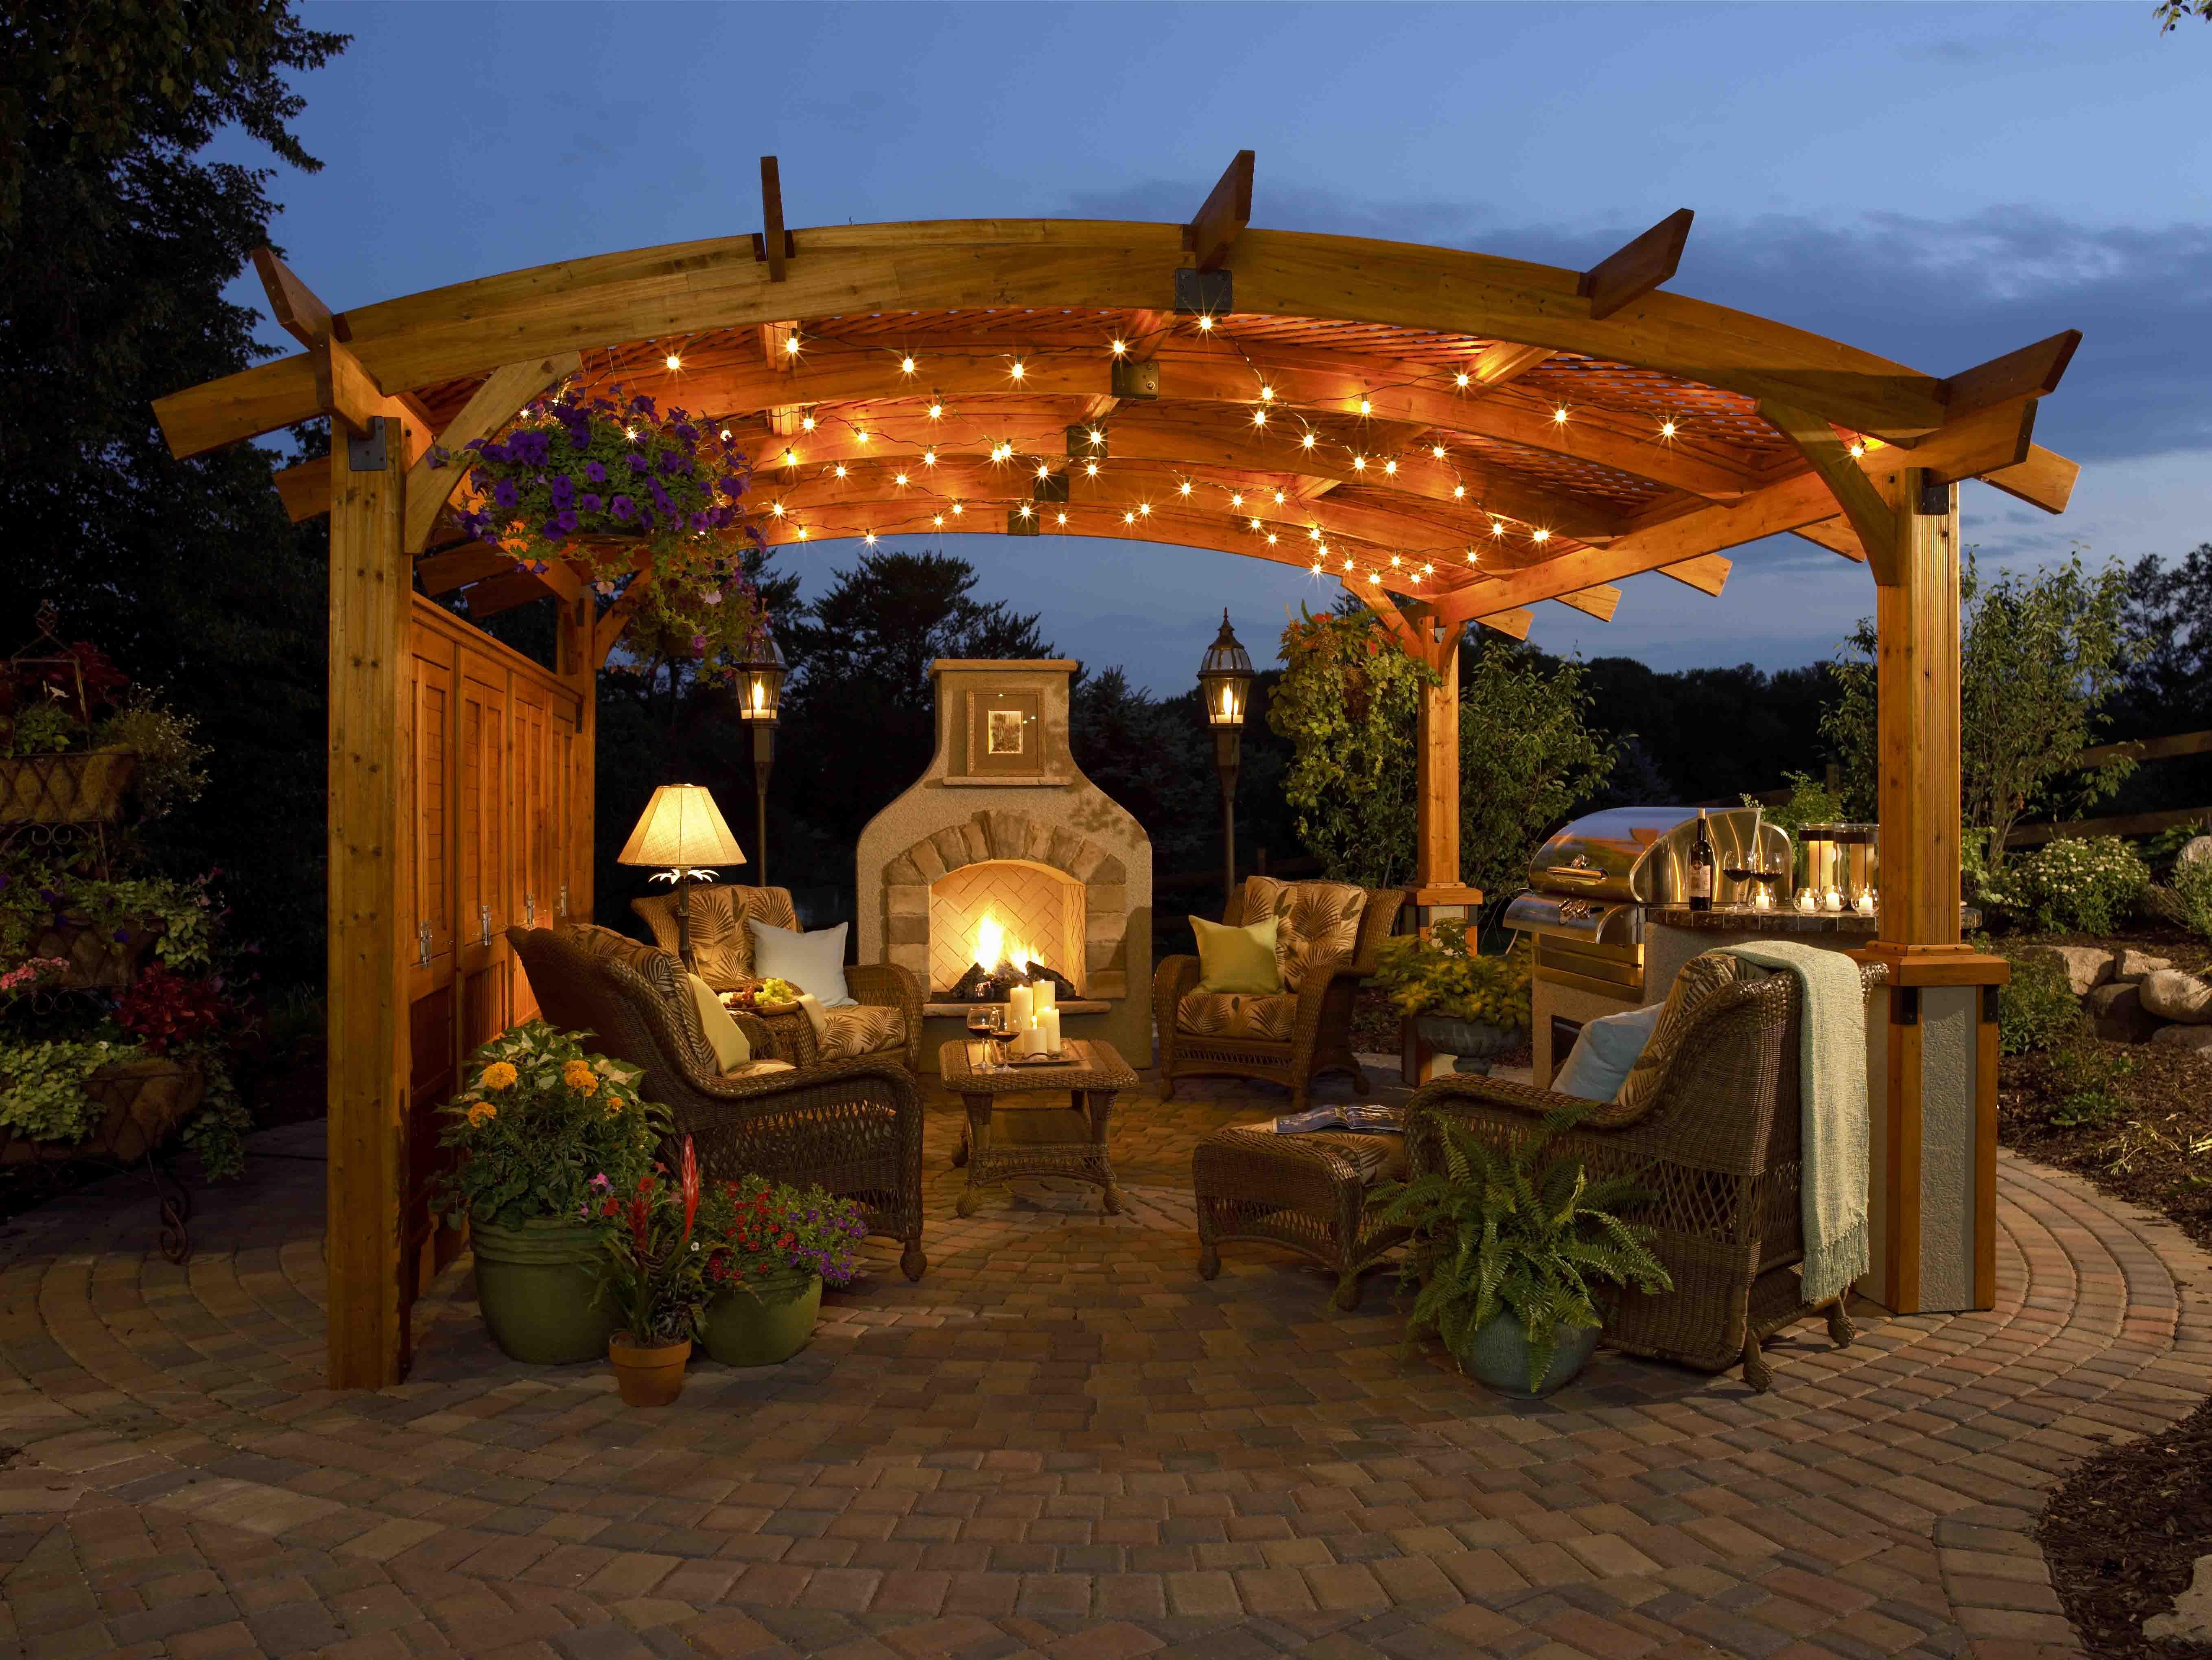 Outdoor Living Areas - Vision Landscape - Design & Build on Outdoor Living And Landscapes id=44259